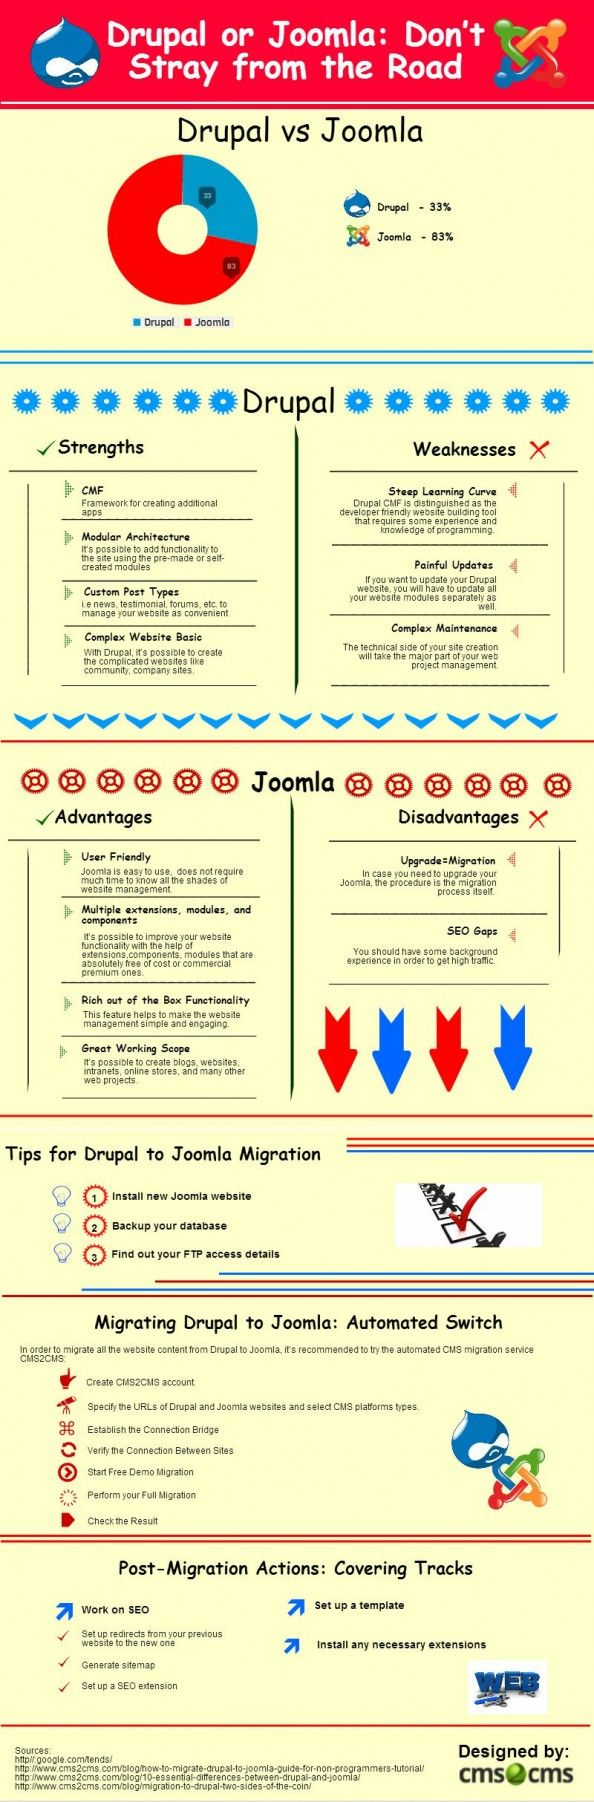 Drupal to Joomla Migration: Chasing Website Sanctity Infographic